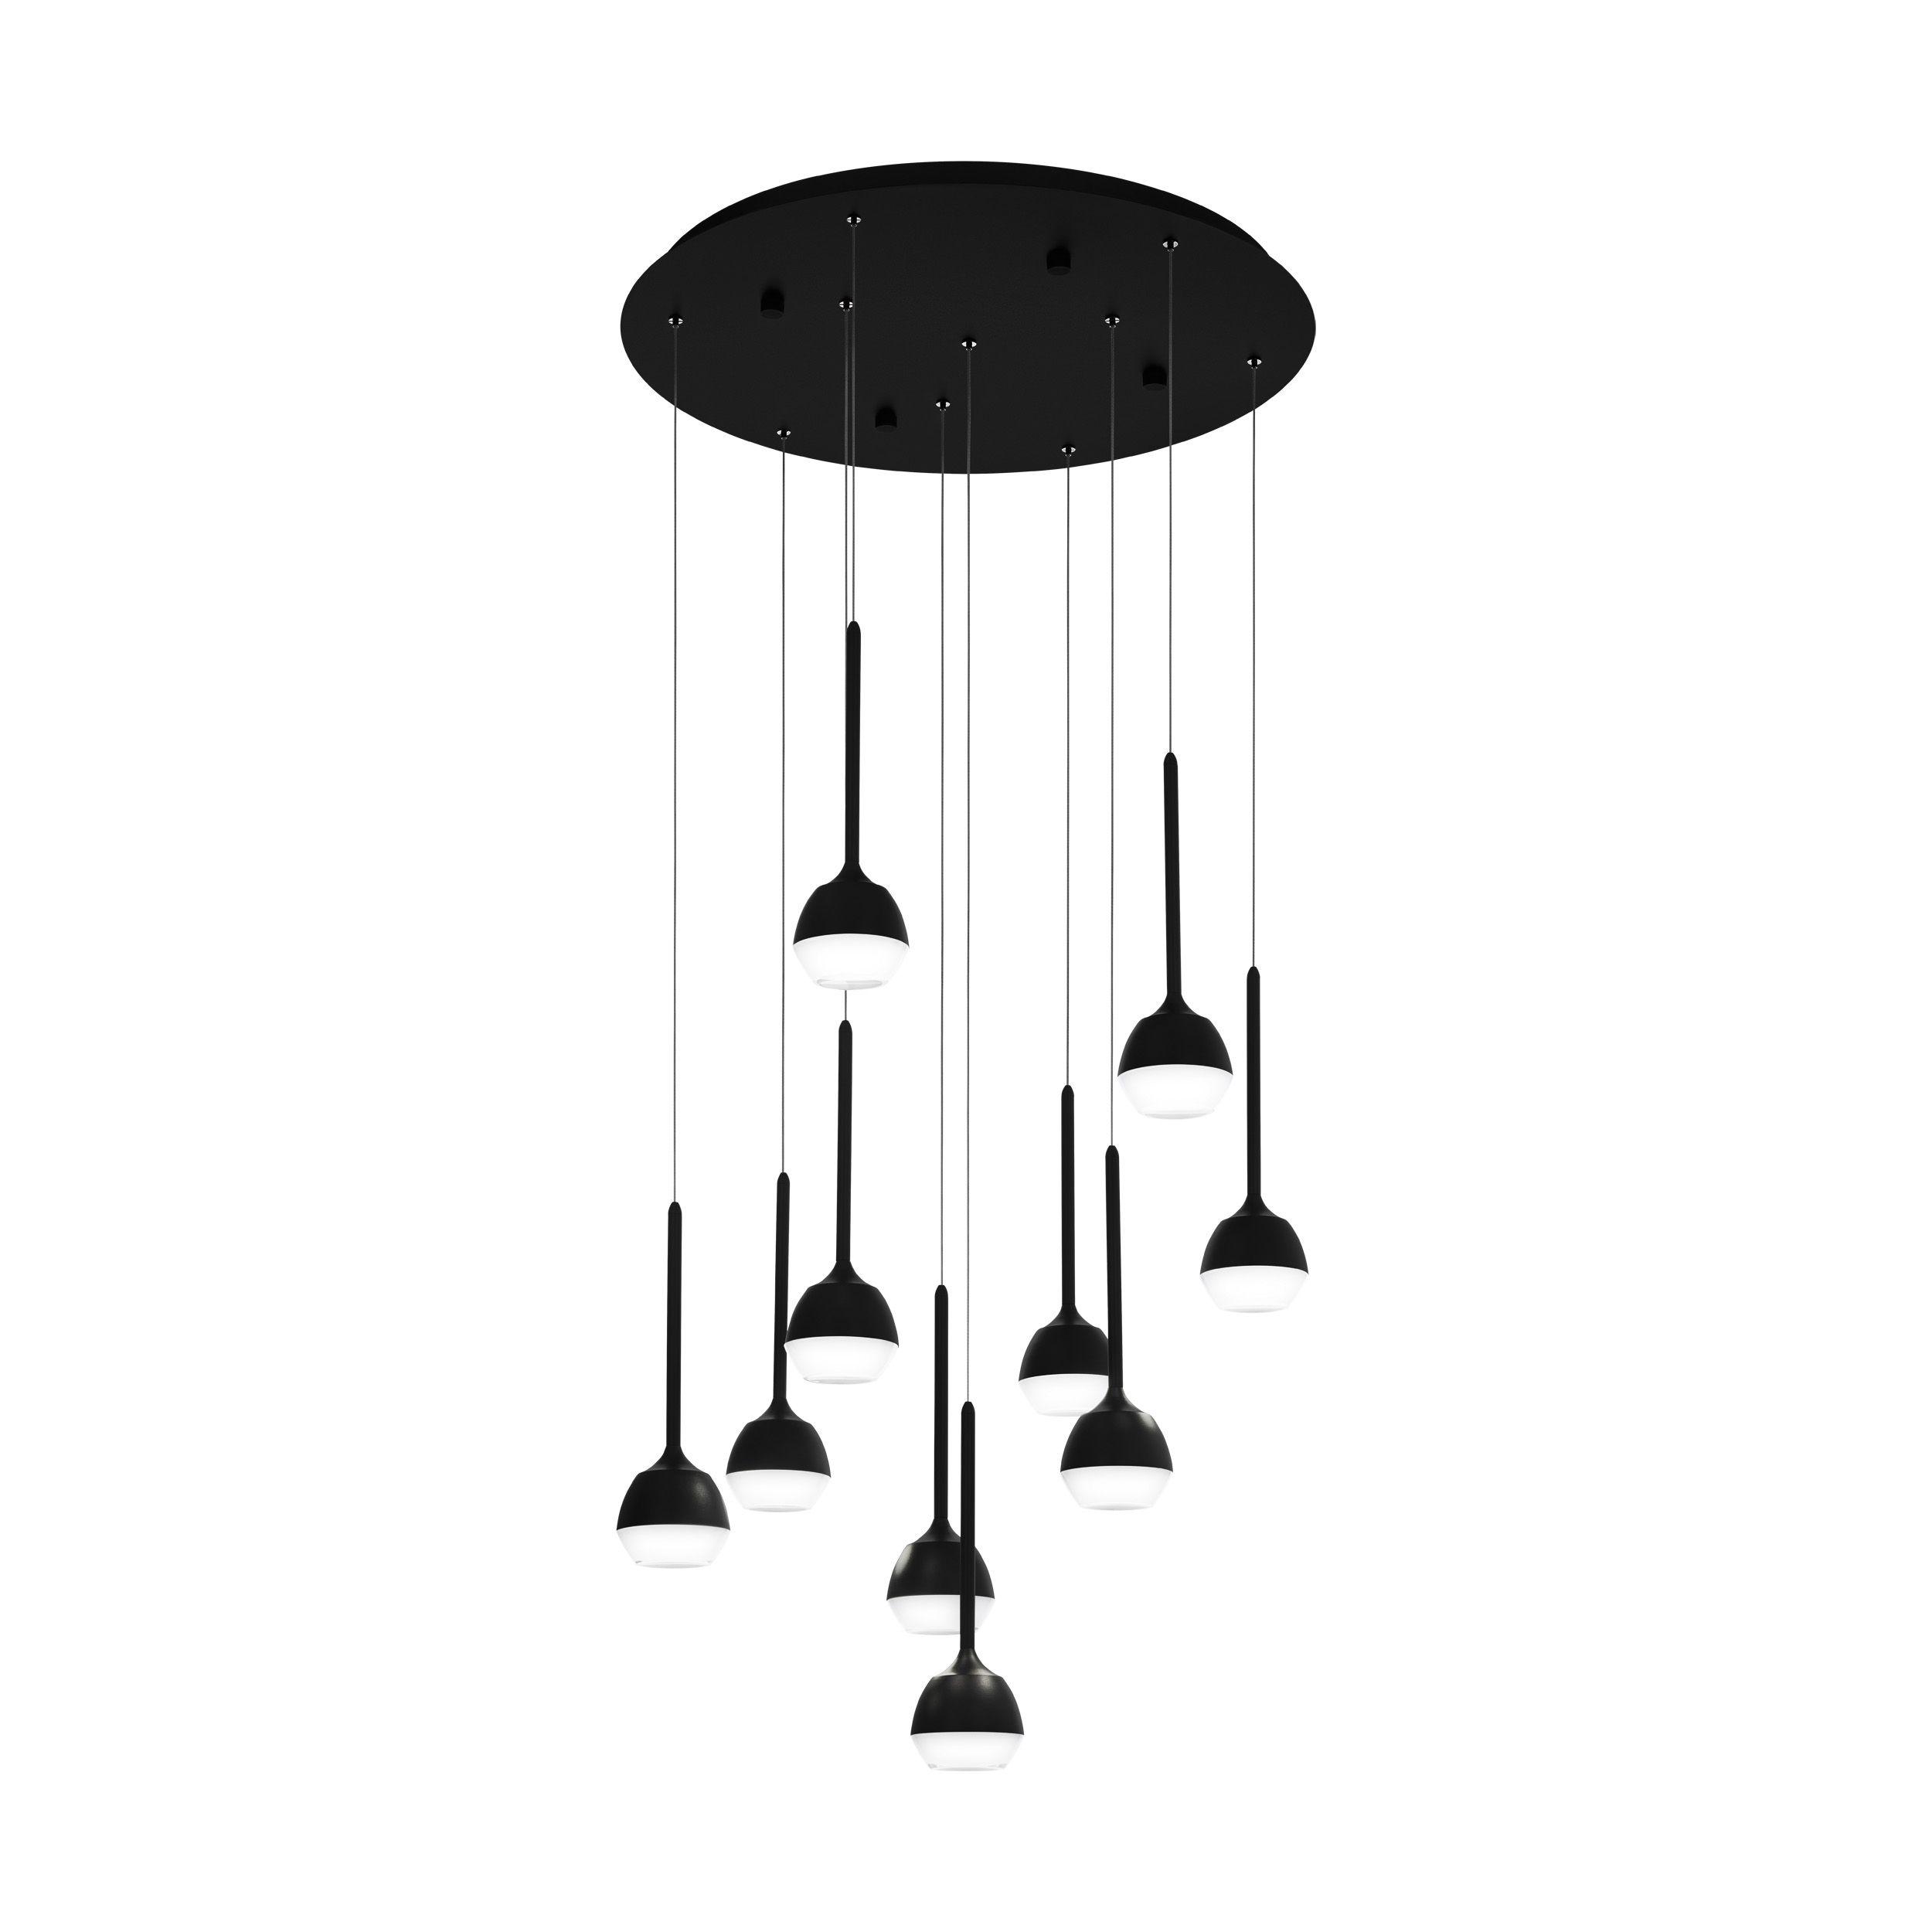 Rippvalgusti NUCETTO LED 10x4,5W 10x530lm hämardatav; metall, must